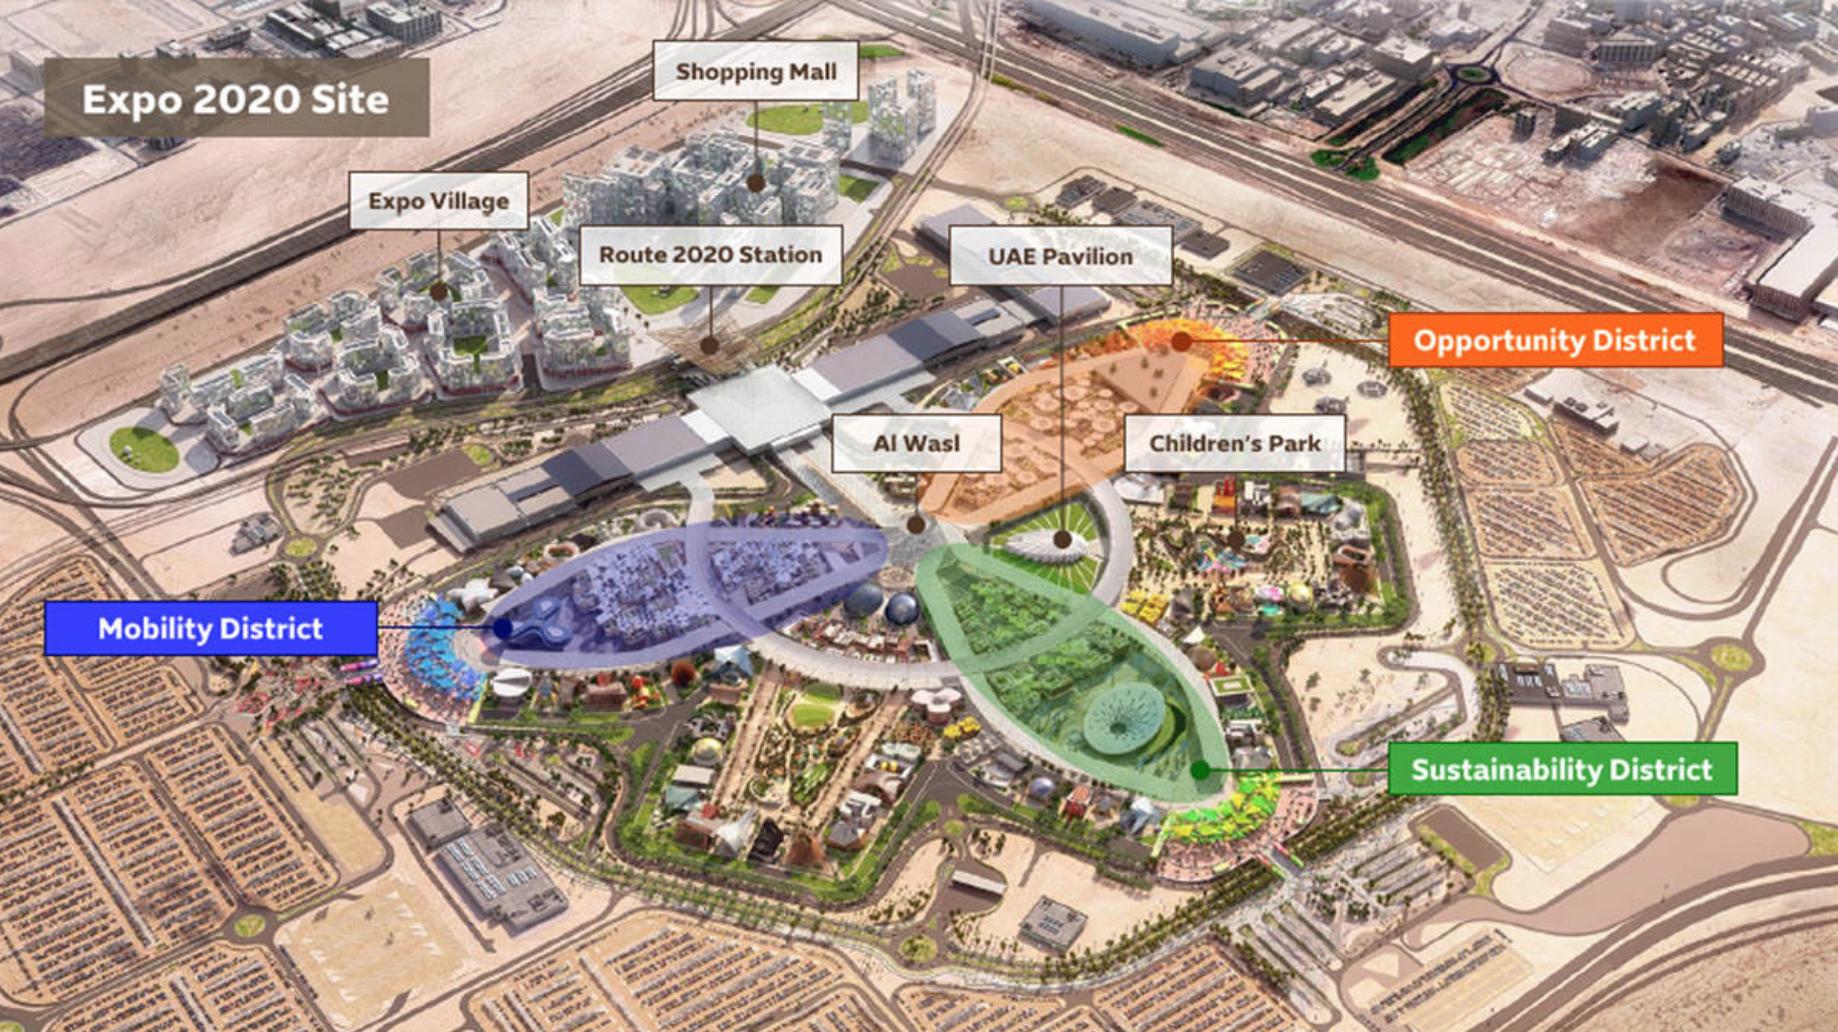 rijksoverheid verspreidt misleiding van Shell op EXPO in Dubai